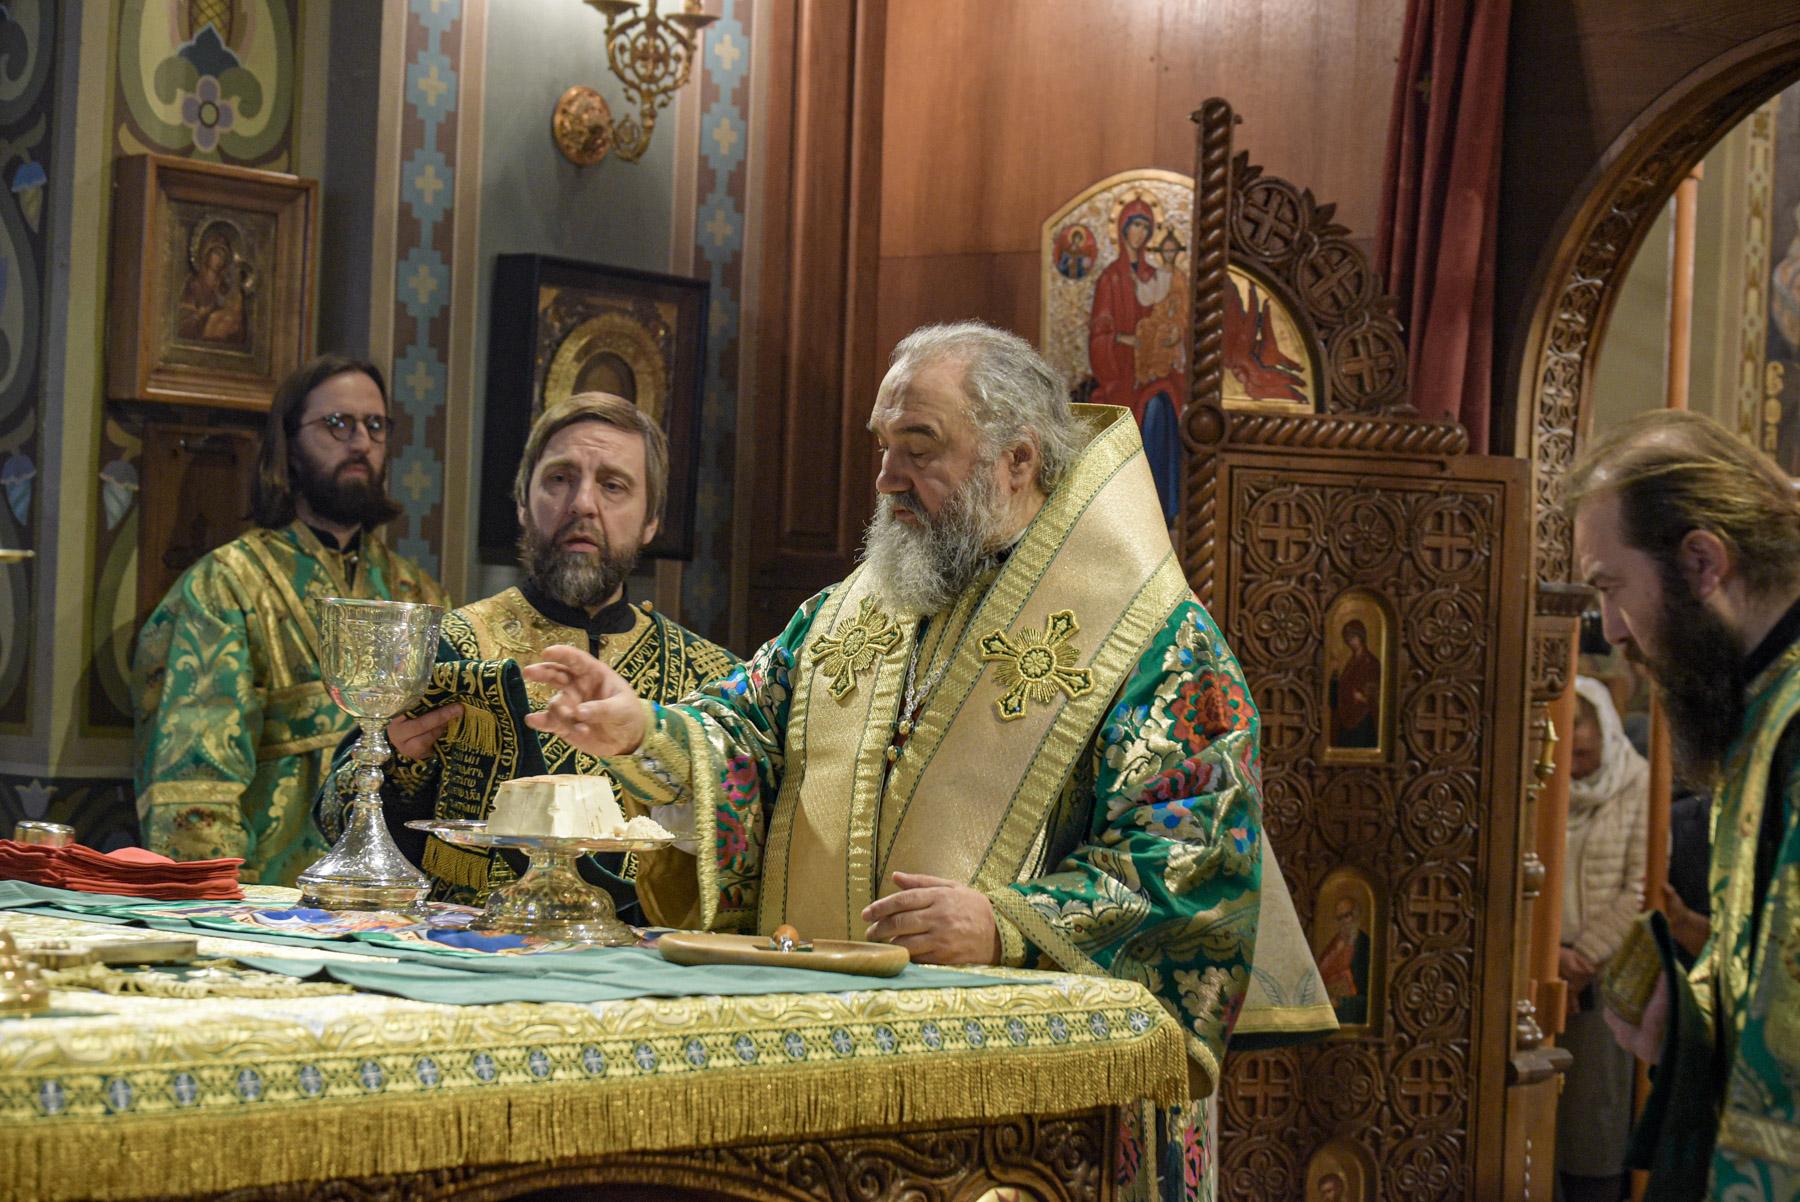 photos of orthodox christmas 0199 2